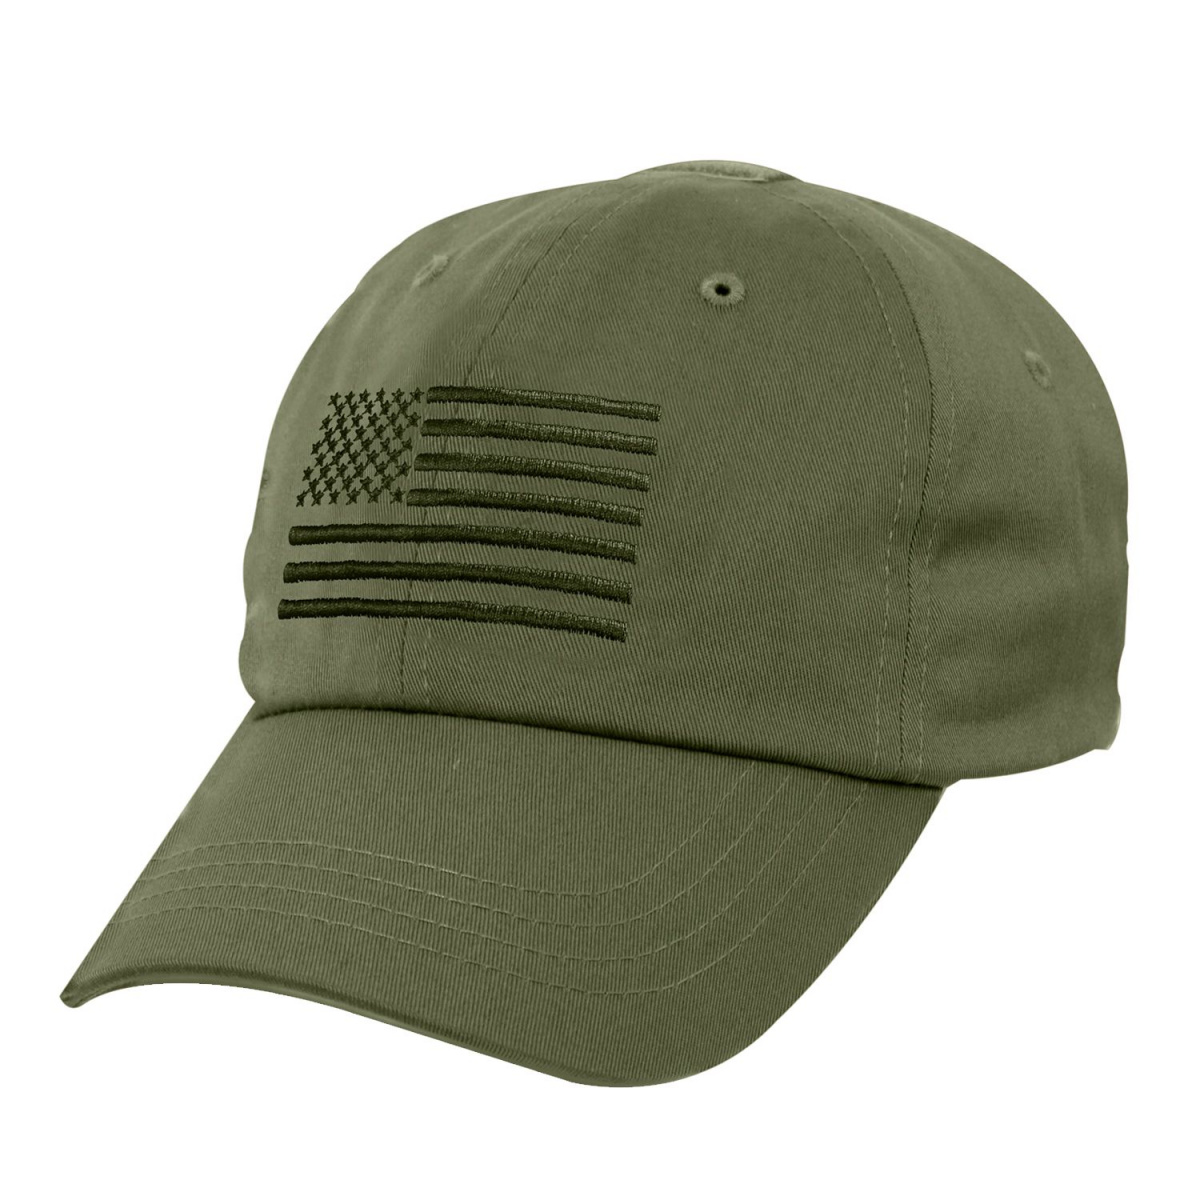 velky 1549459661-cepice-baseball-tactical-operator-vlajka-us-zelena.jpg bfd6c7a053